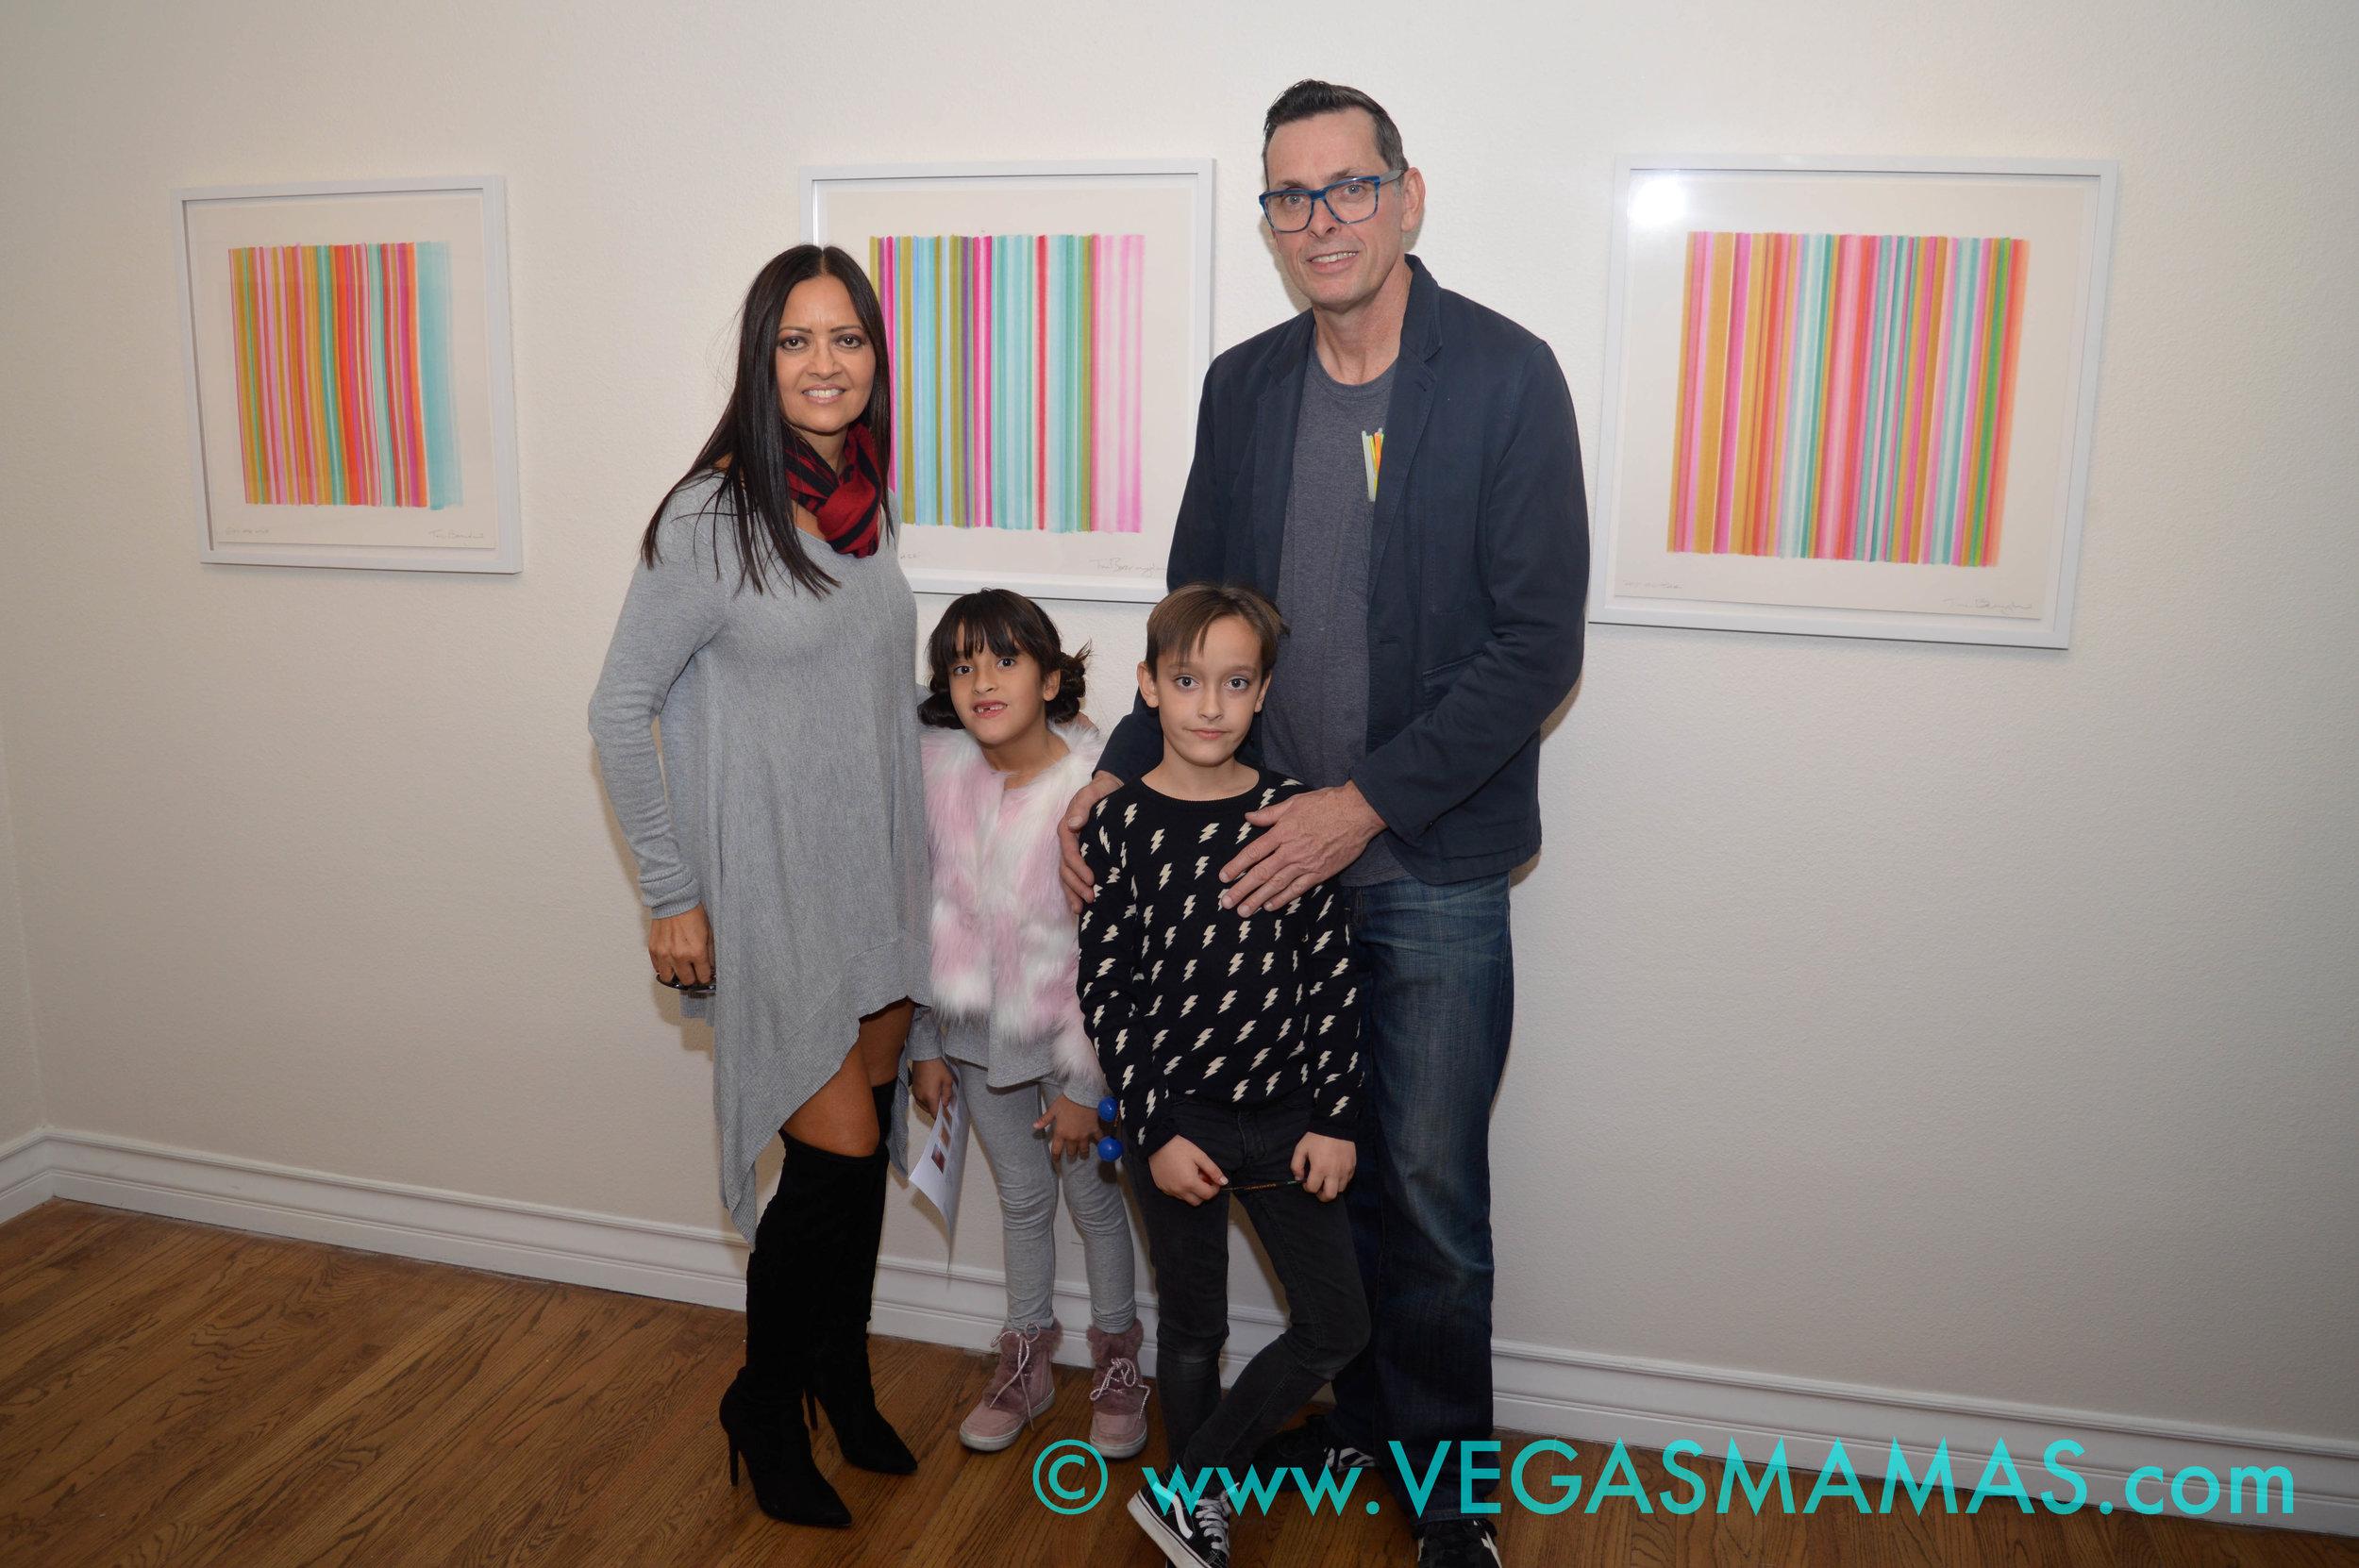 #BavBabe Kim Bavington & Tim Bavington with their twins Lily & Jet